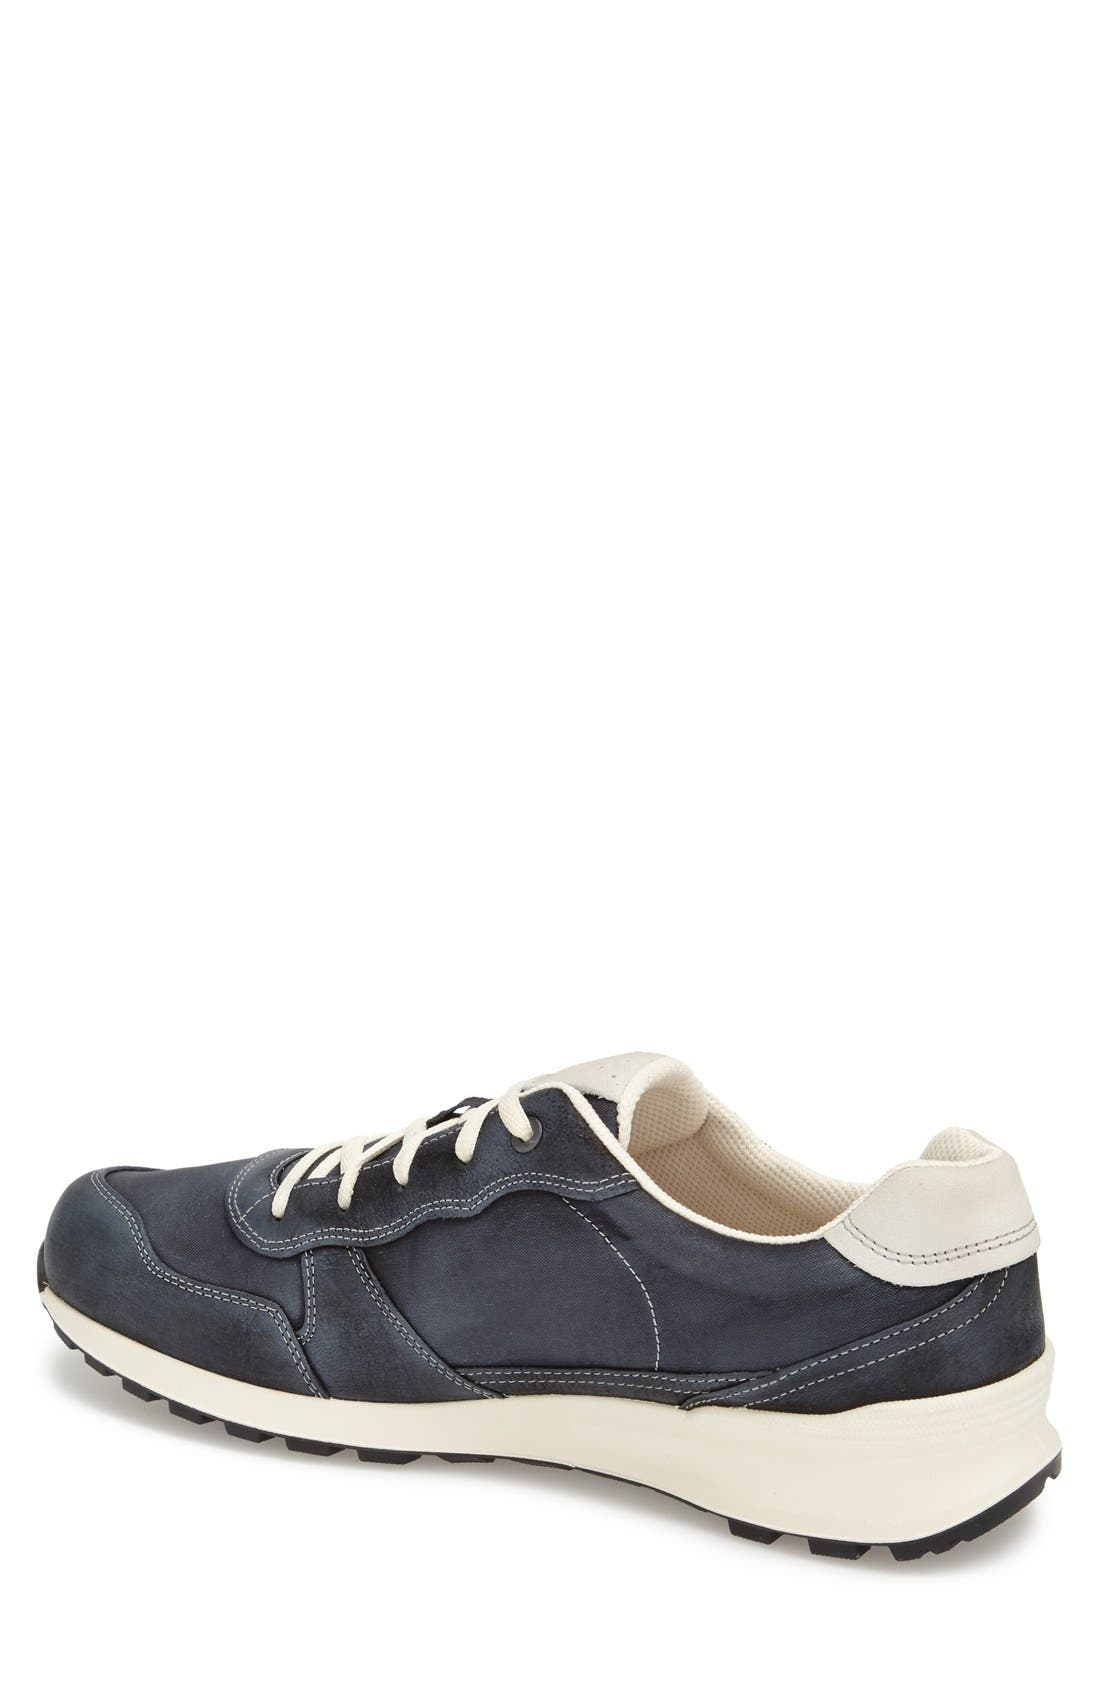 'CS14' Sneaker,                             Alternate thumbnail 3, color,                             015